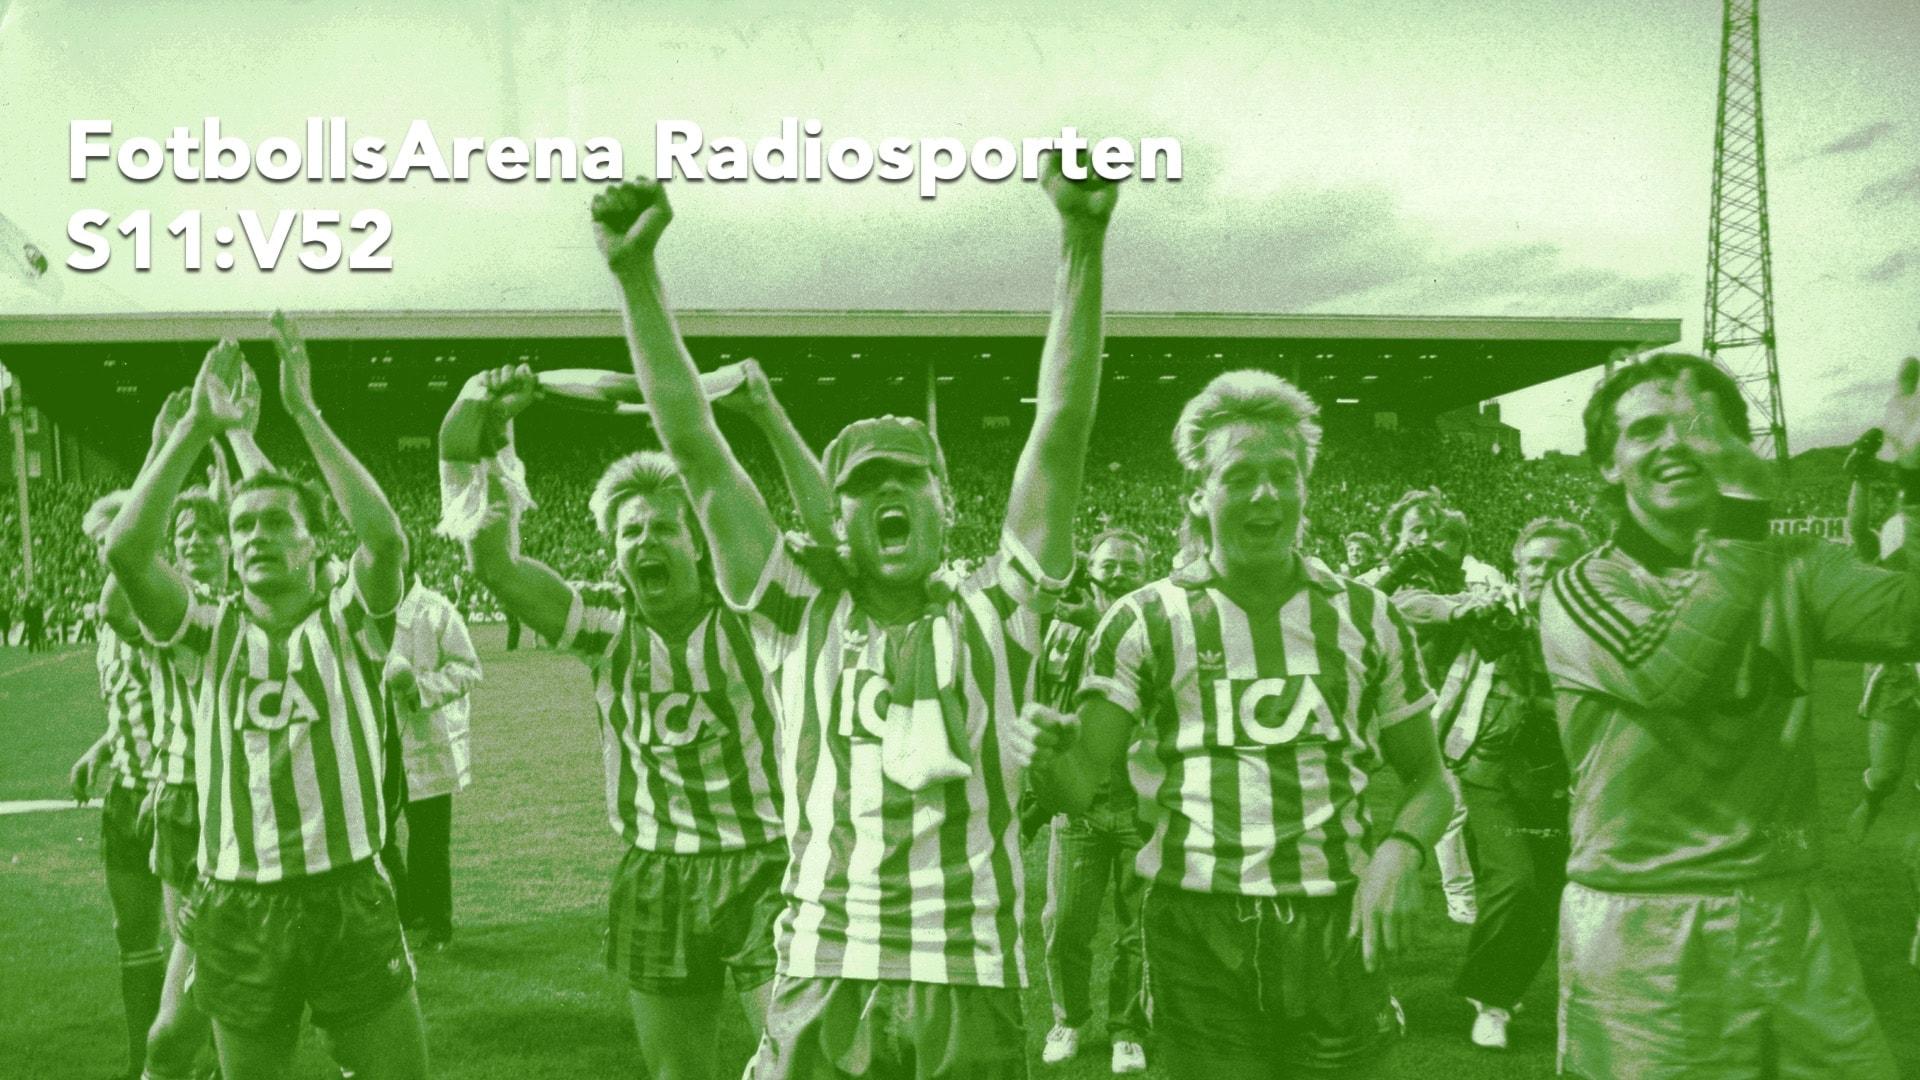 FotbollsArena nyårsspecial: UEFA-cupfinalen 1987